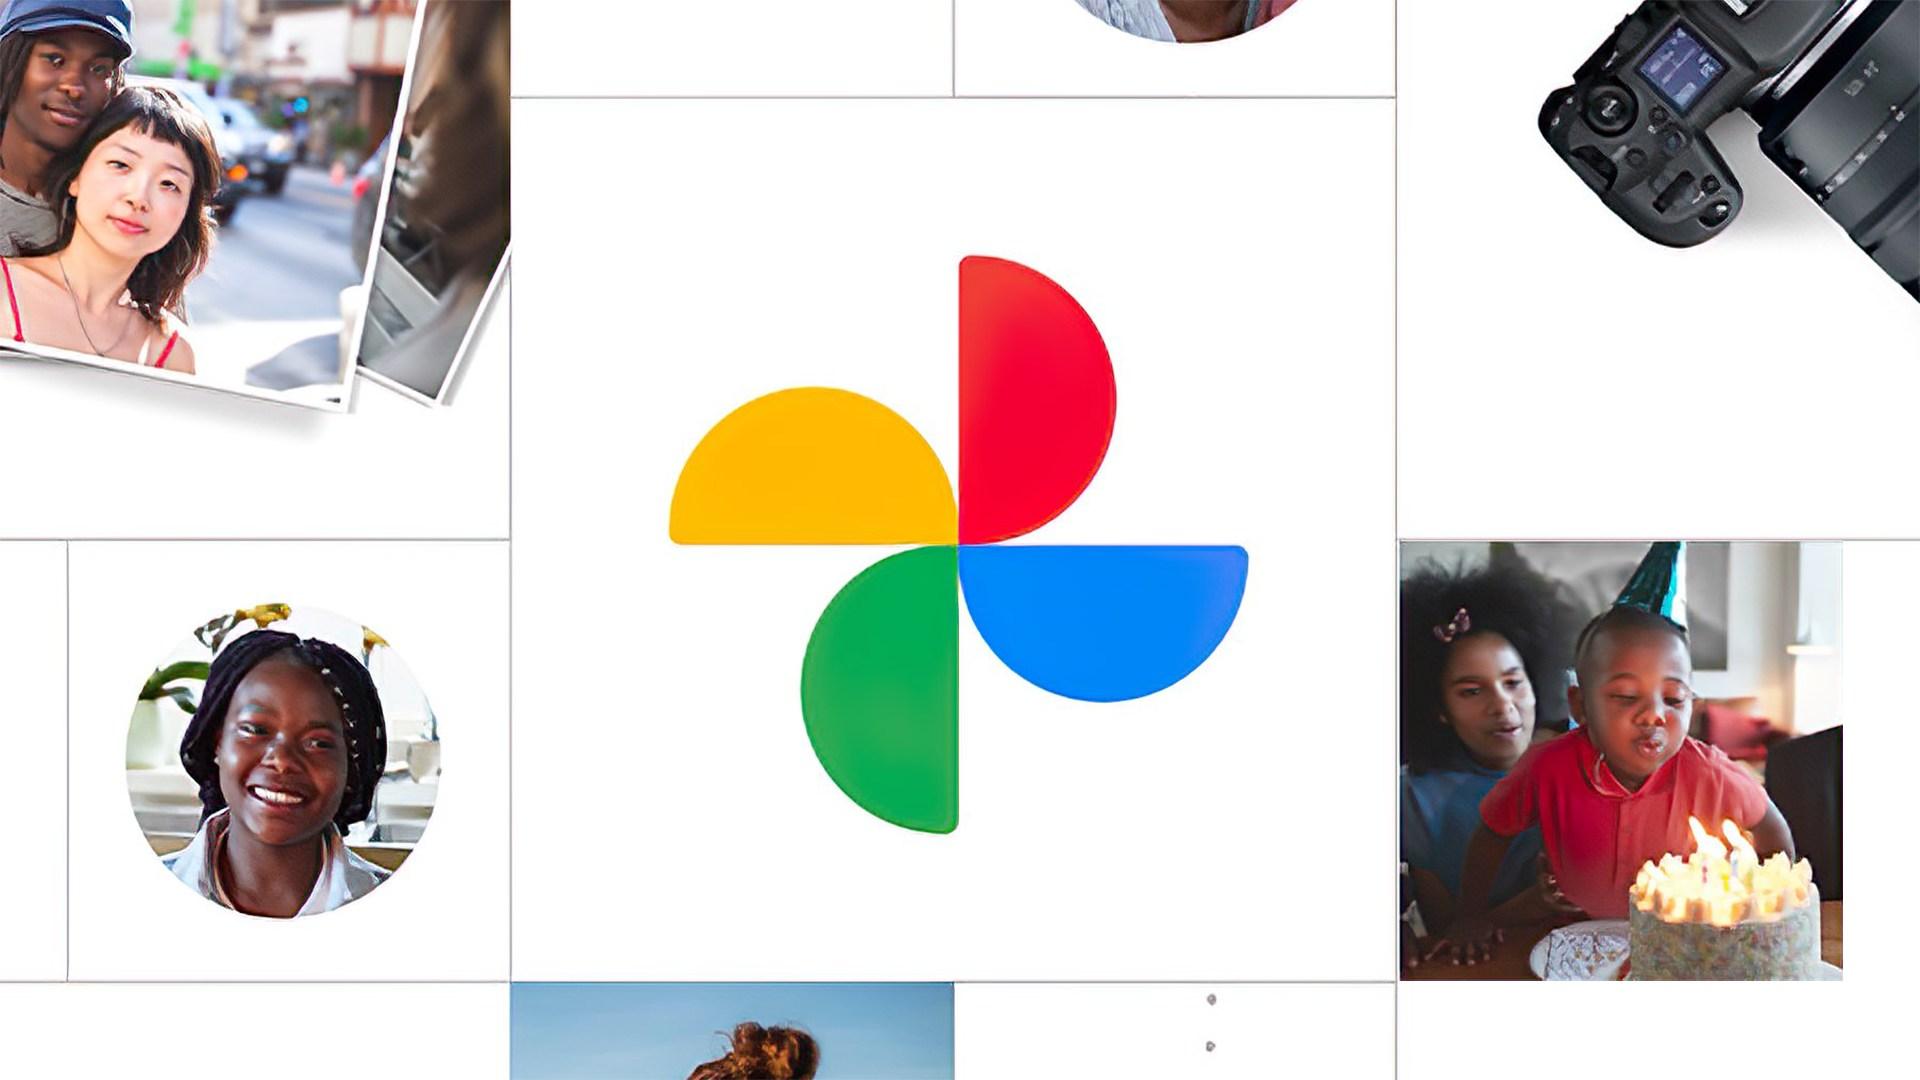 Logo, Kamera, Bilder, Videos, Fotos, Aufnahmen, Google Photos, Google Fotos